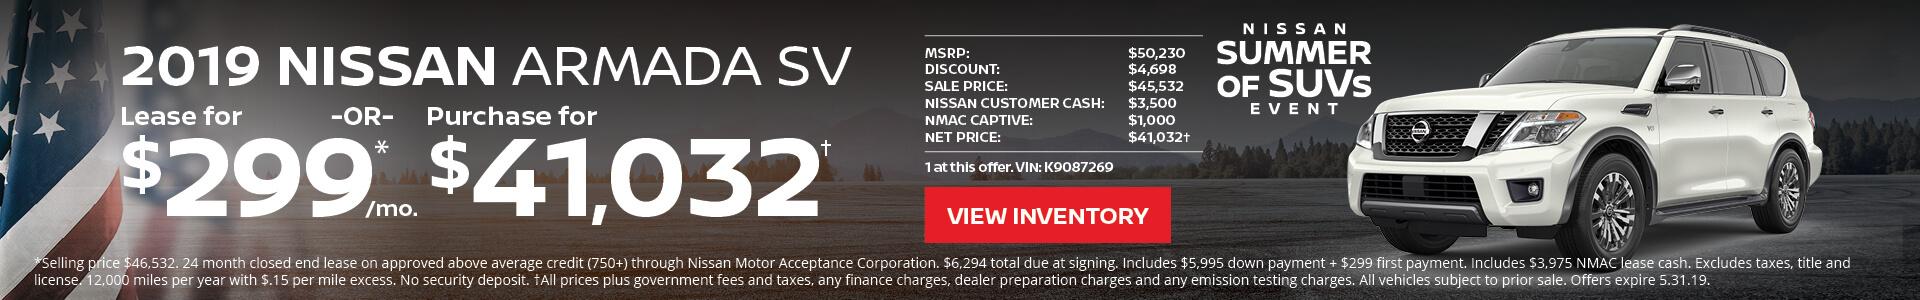 Nissan Armanda $299 Lease